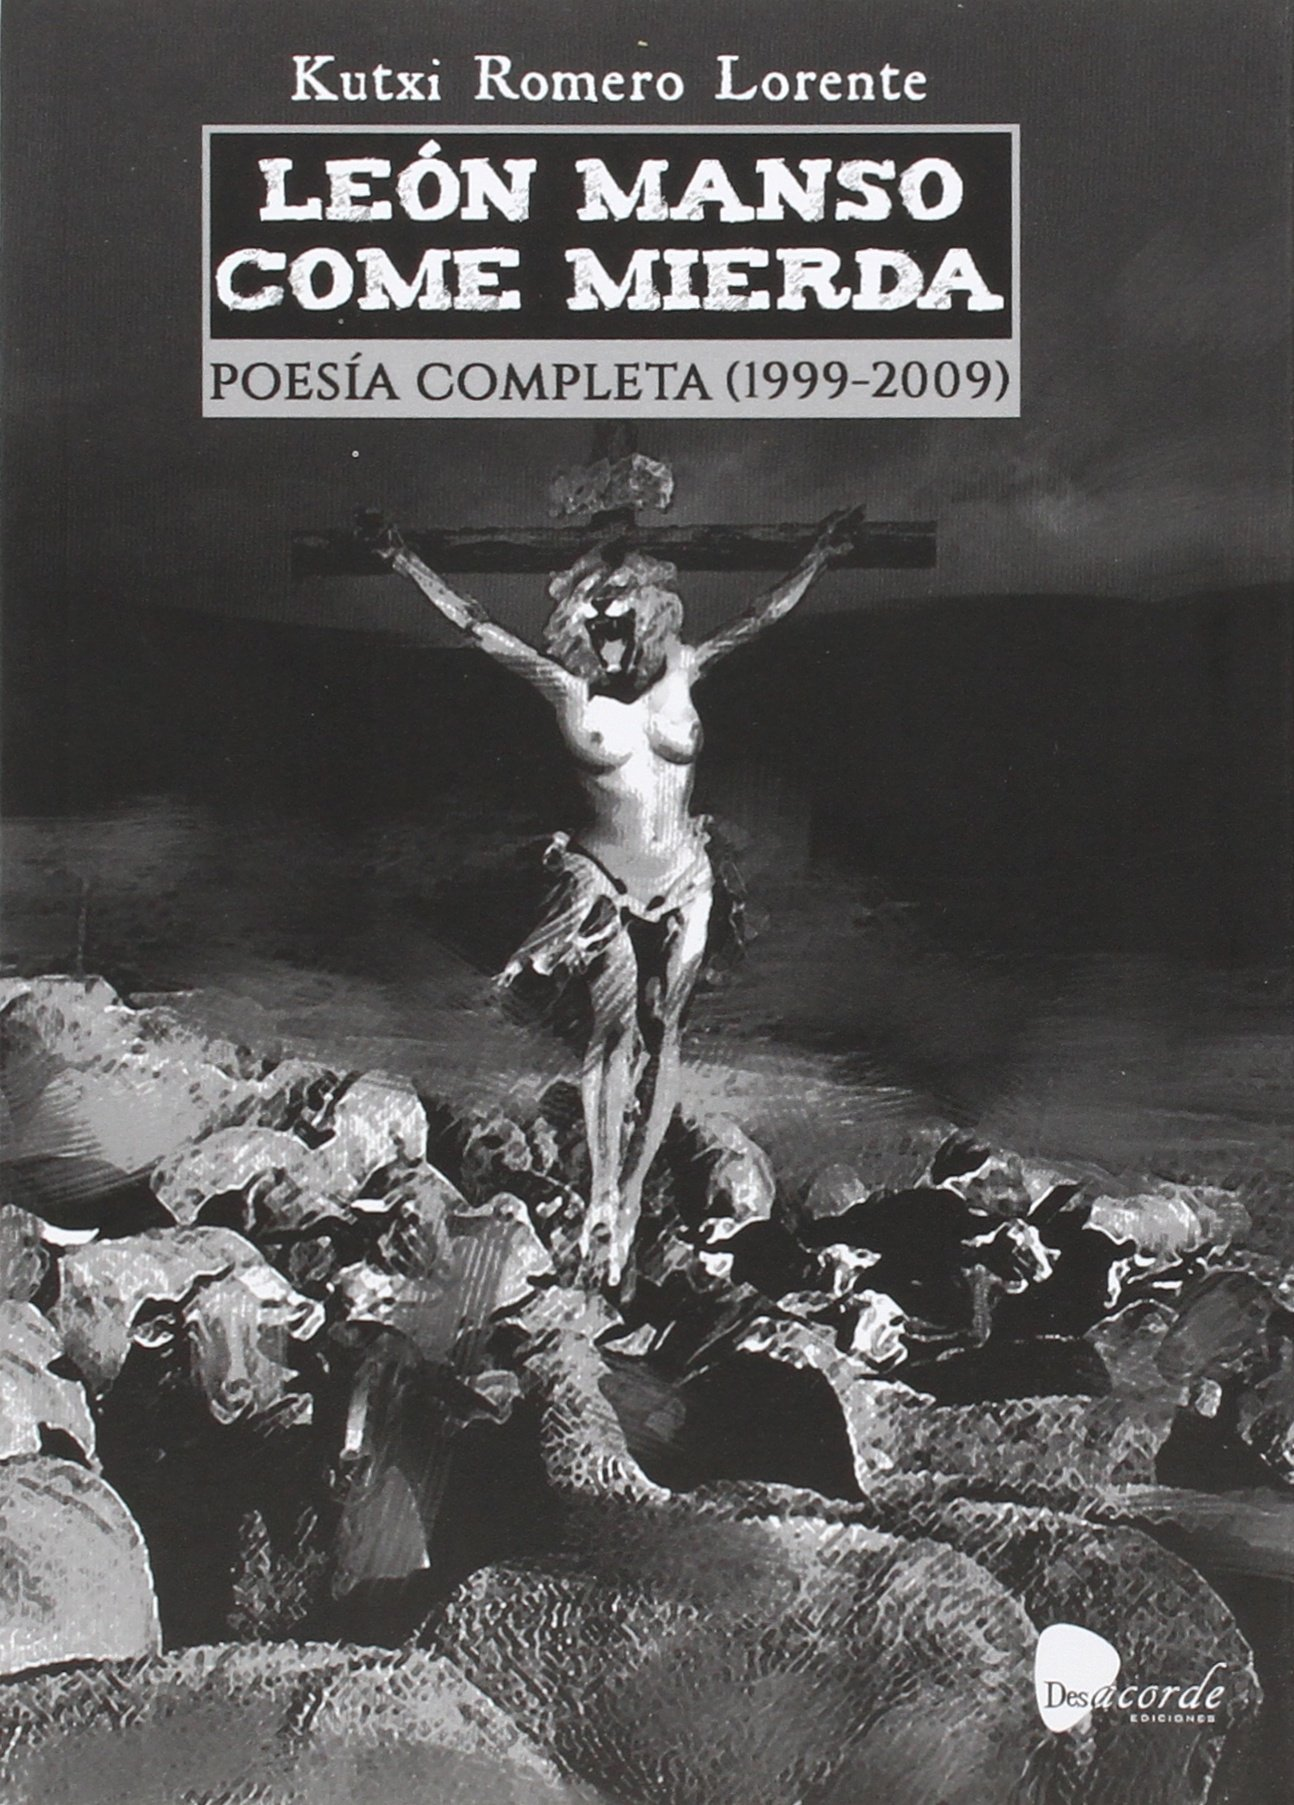 LEÓN MANSO COME MIERDA: Amazon.es: Romero Lorente, Kutxi: Libros